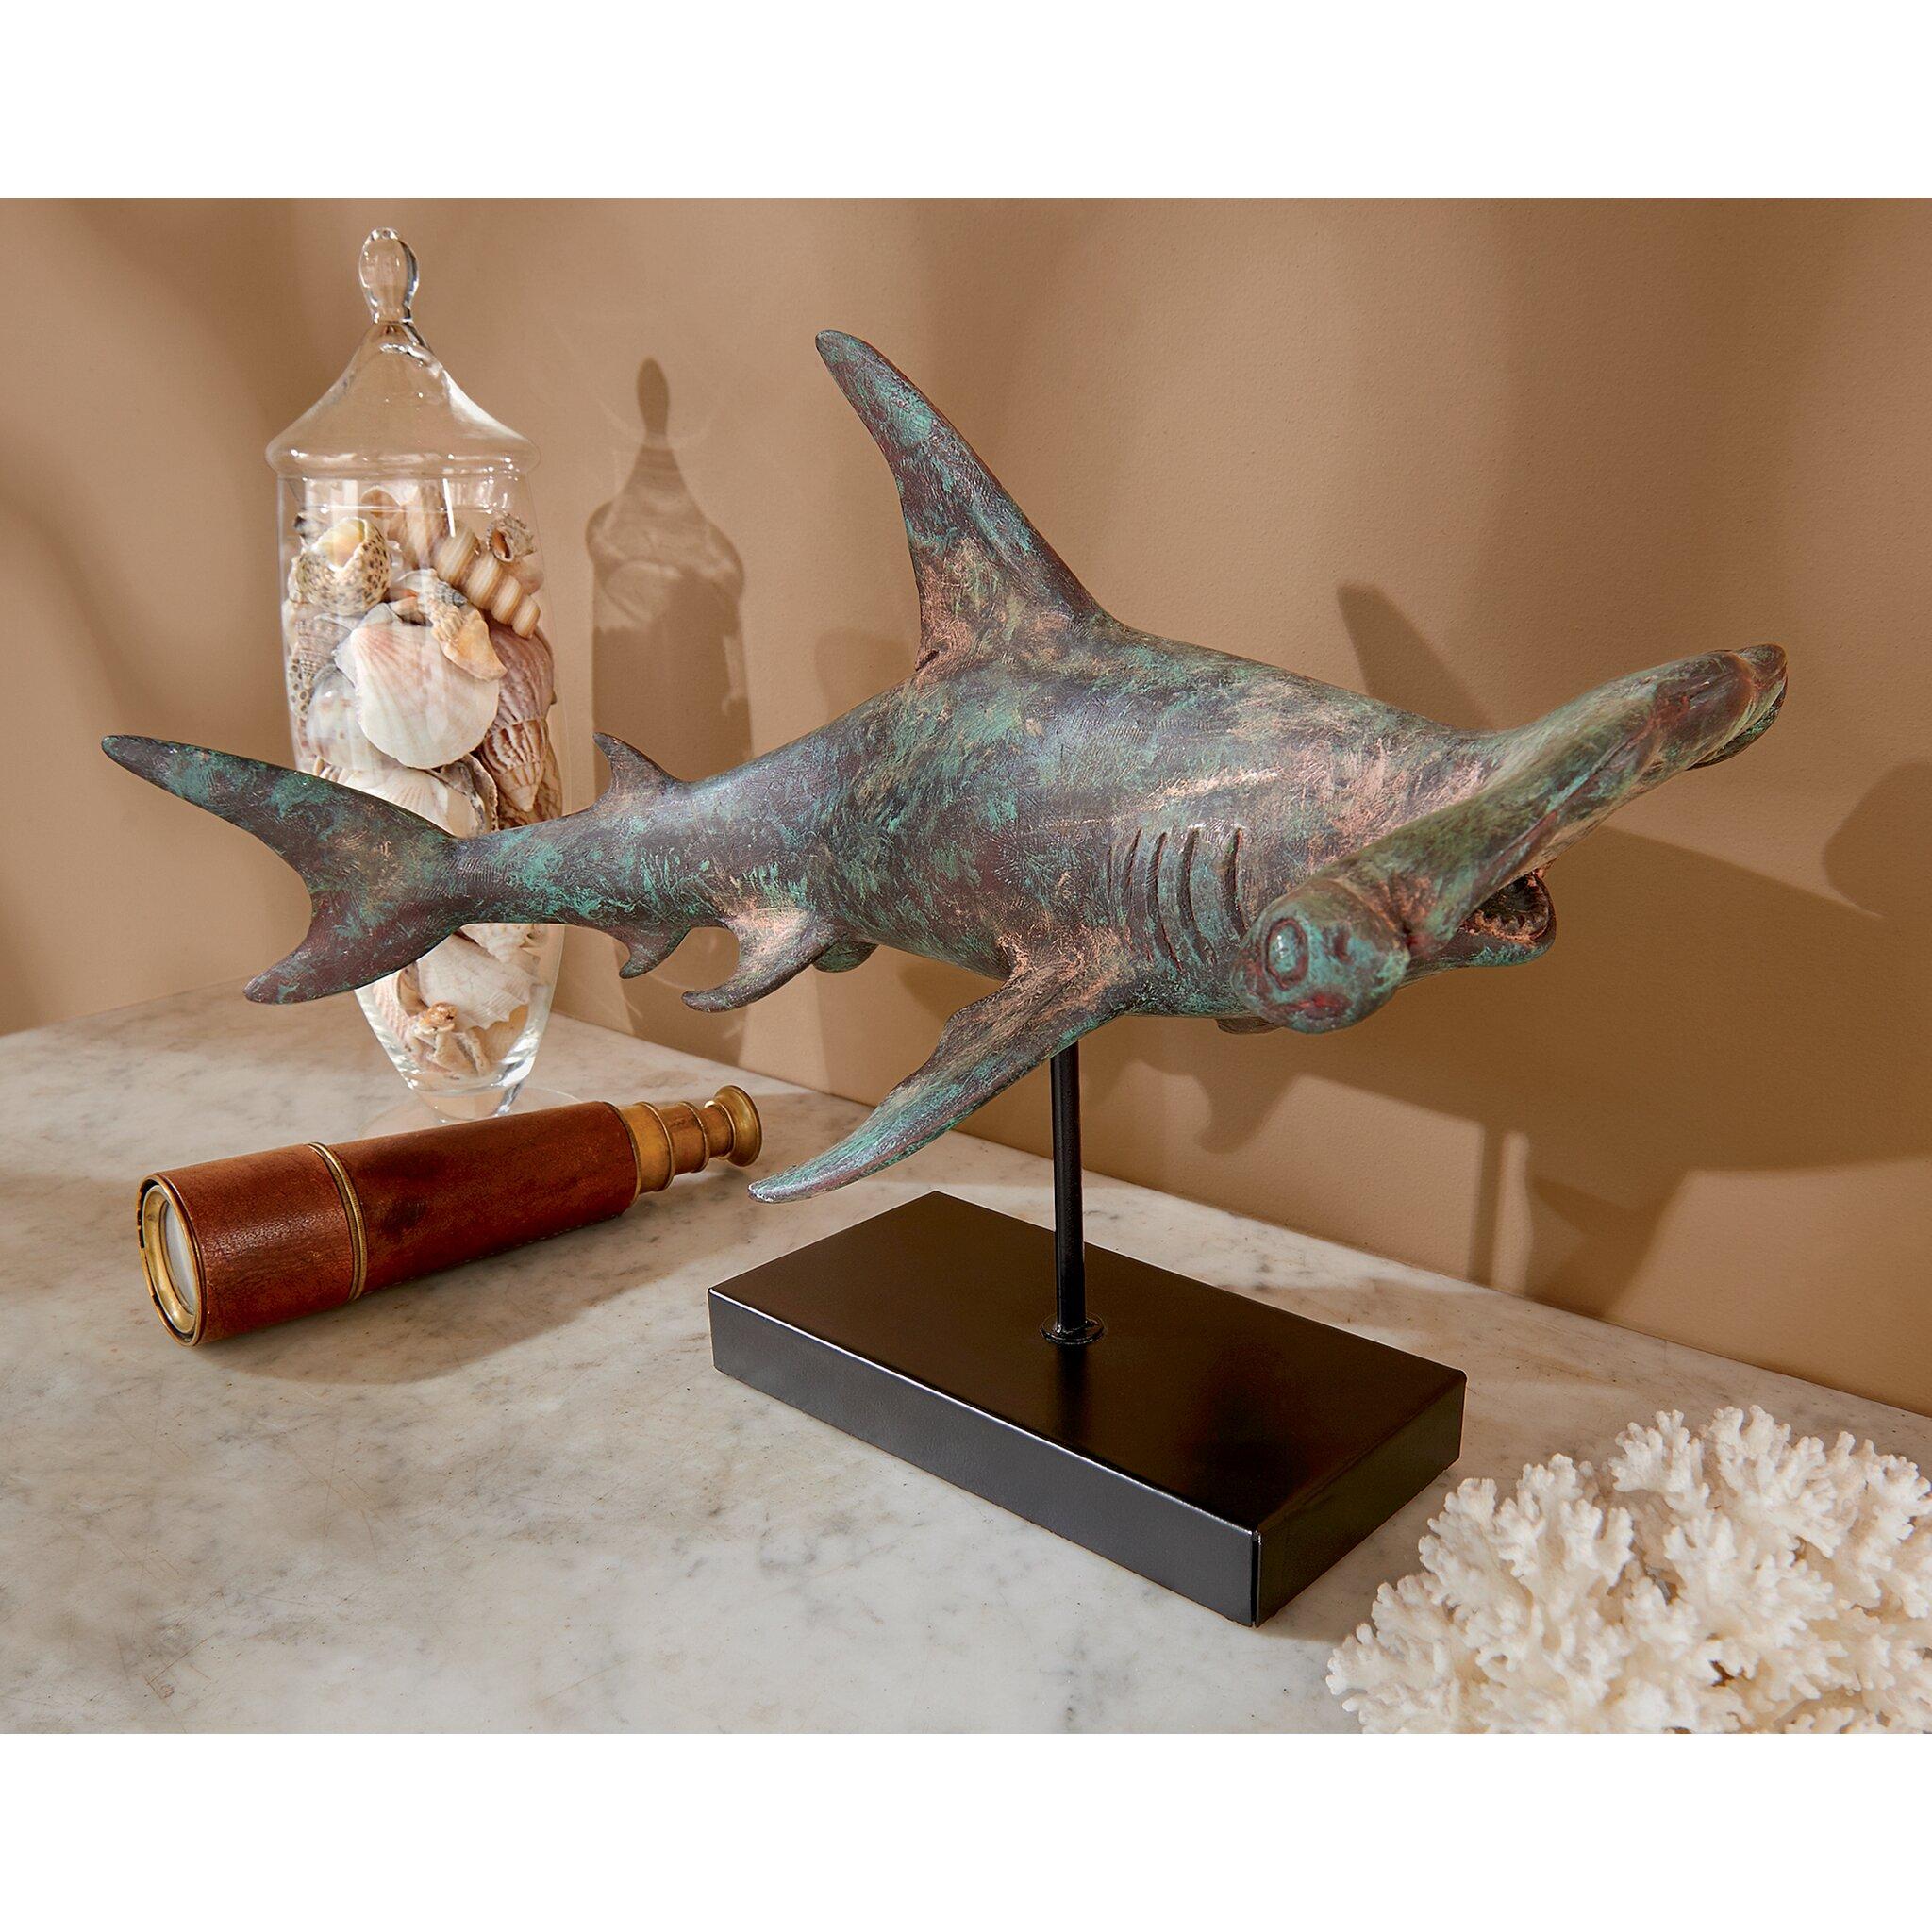 Design toscano consummate predator hammerhead shark statue for Design toscano